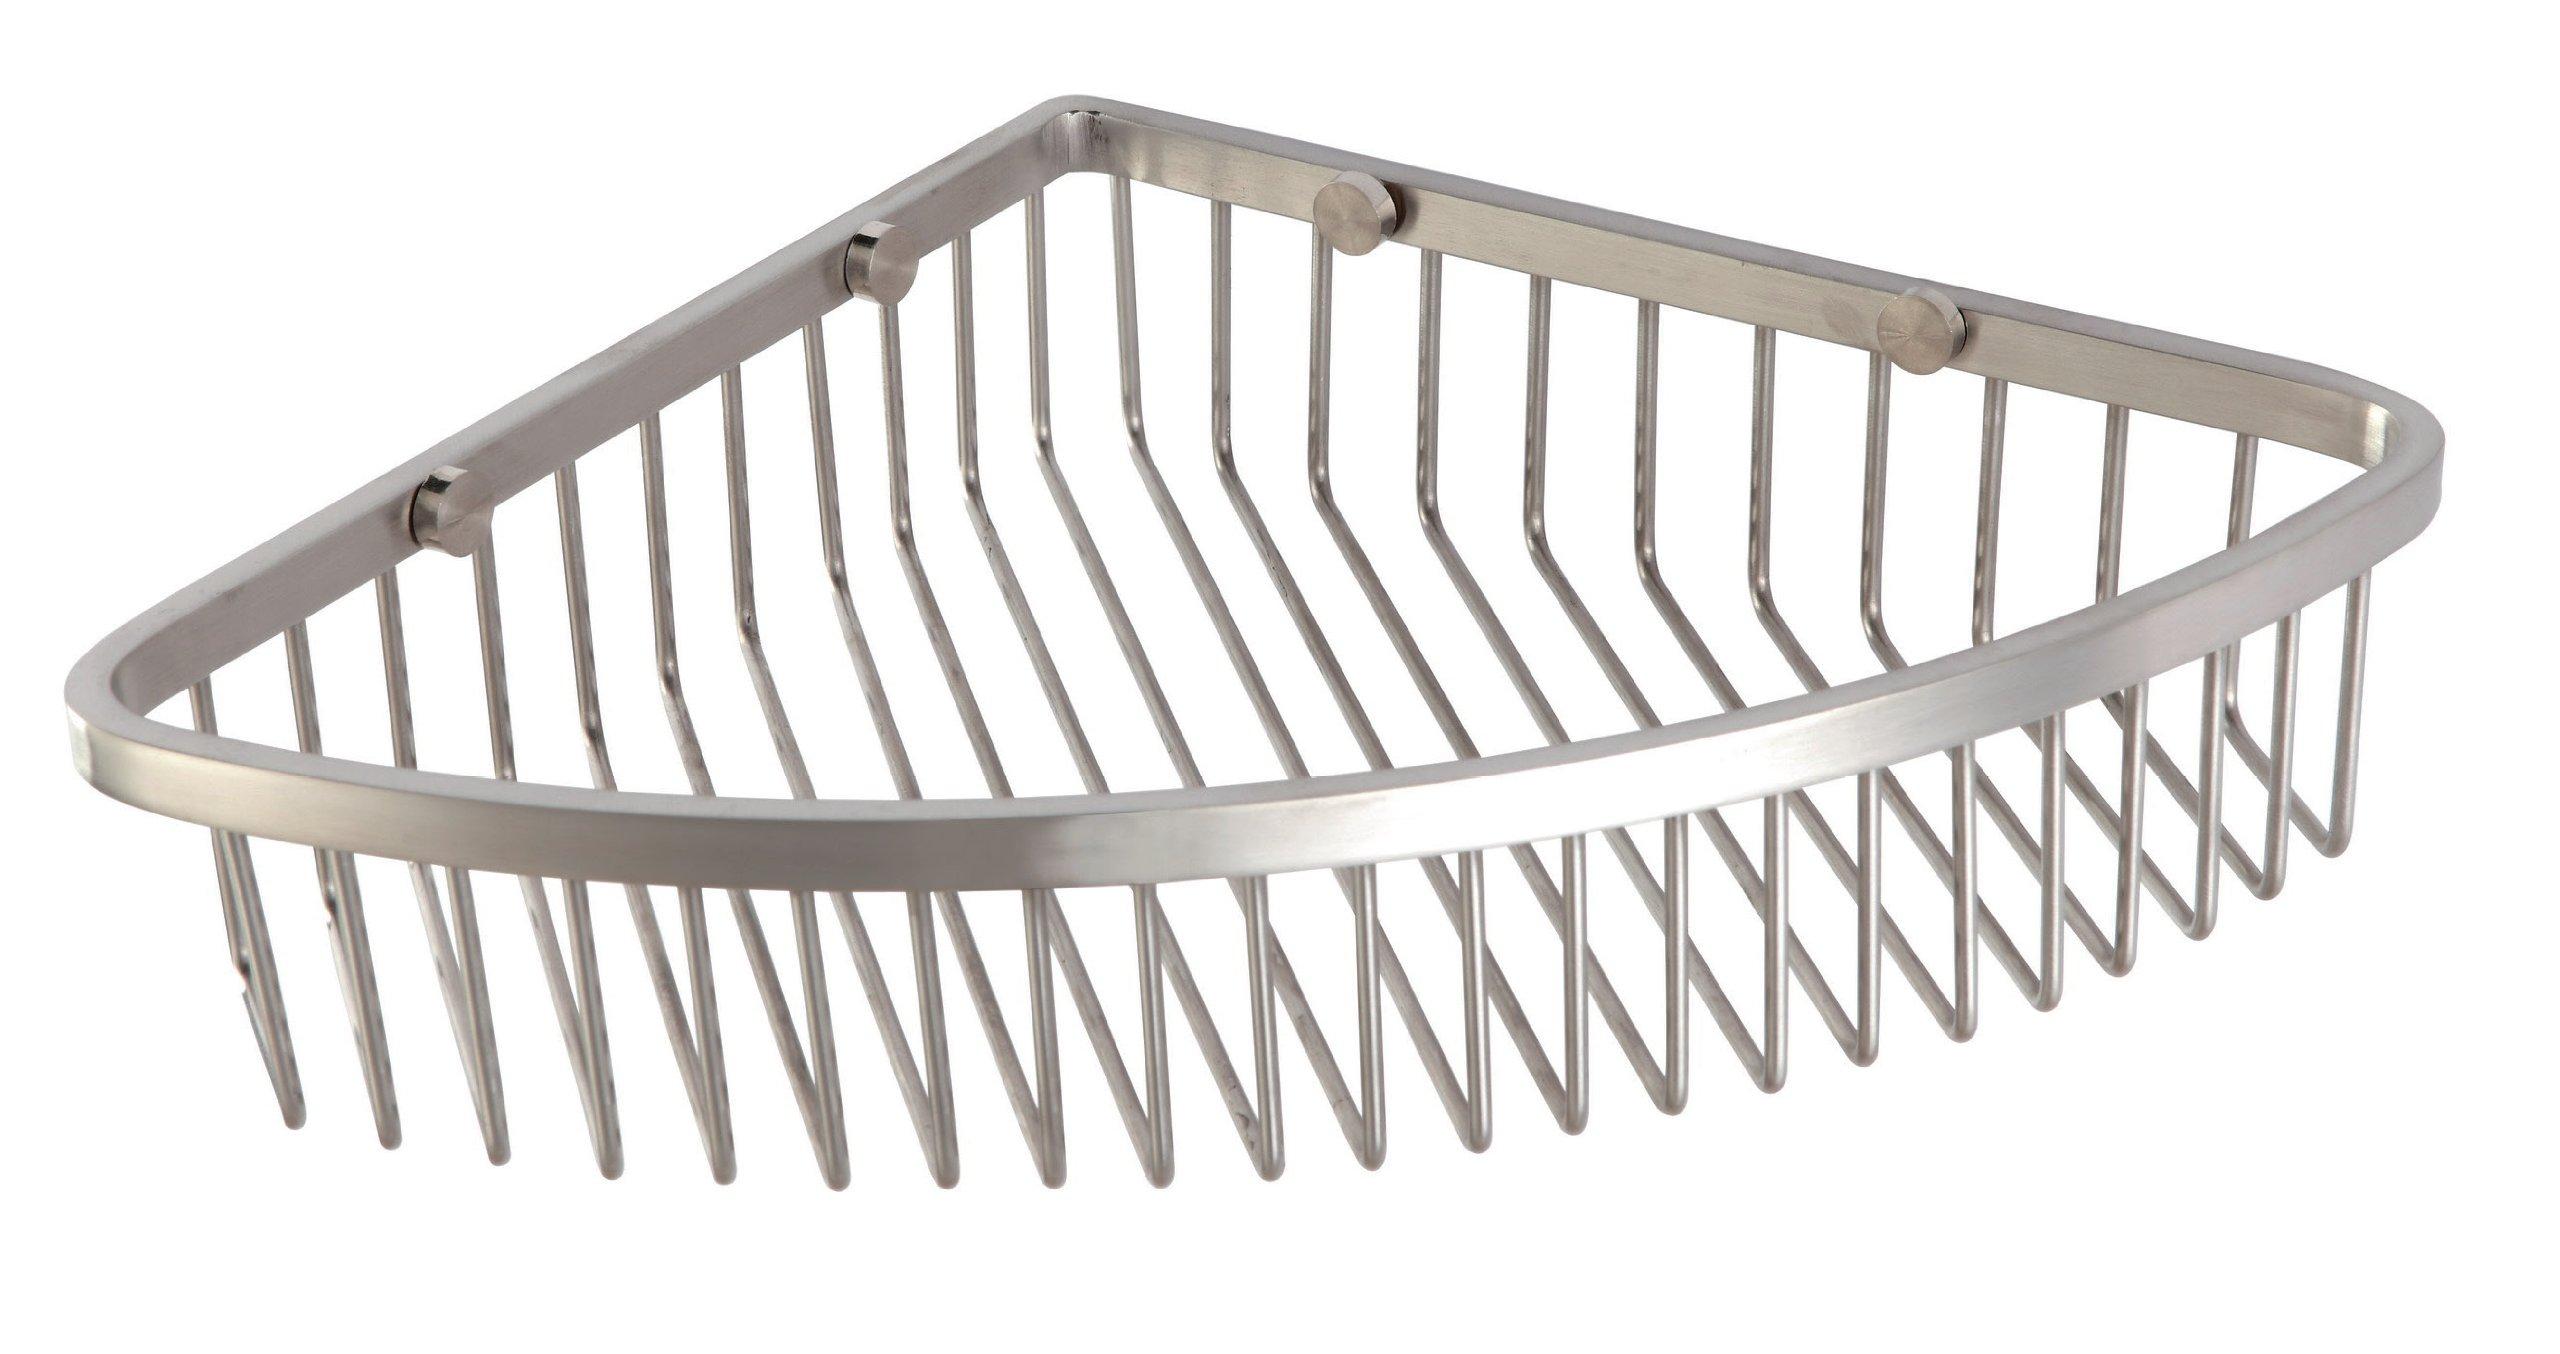 Corner Shower Caddy - Stainless Steel Bathroom Wall Mounted Storage - Brushed Nickel